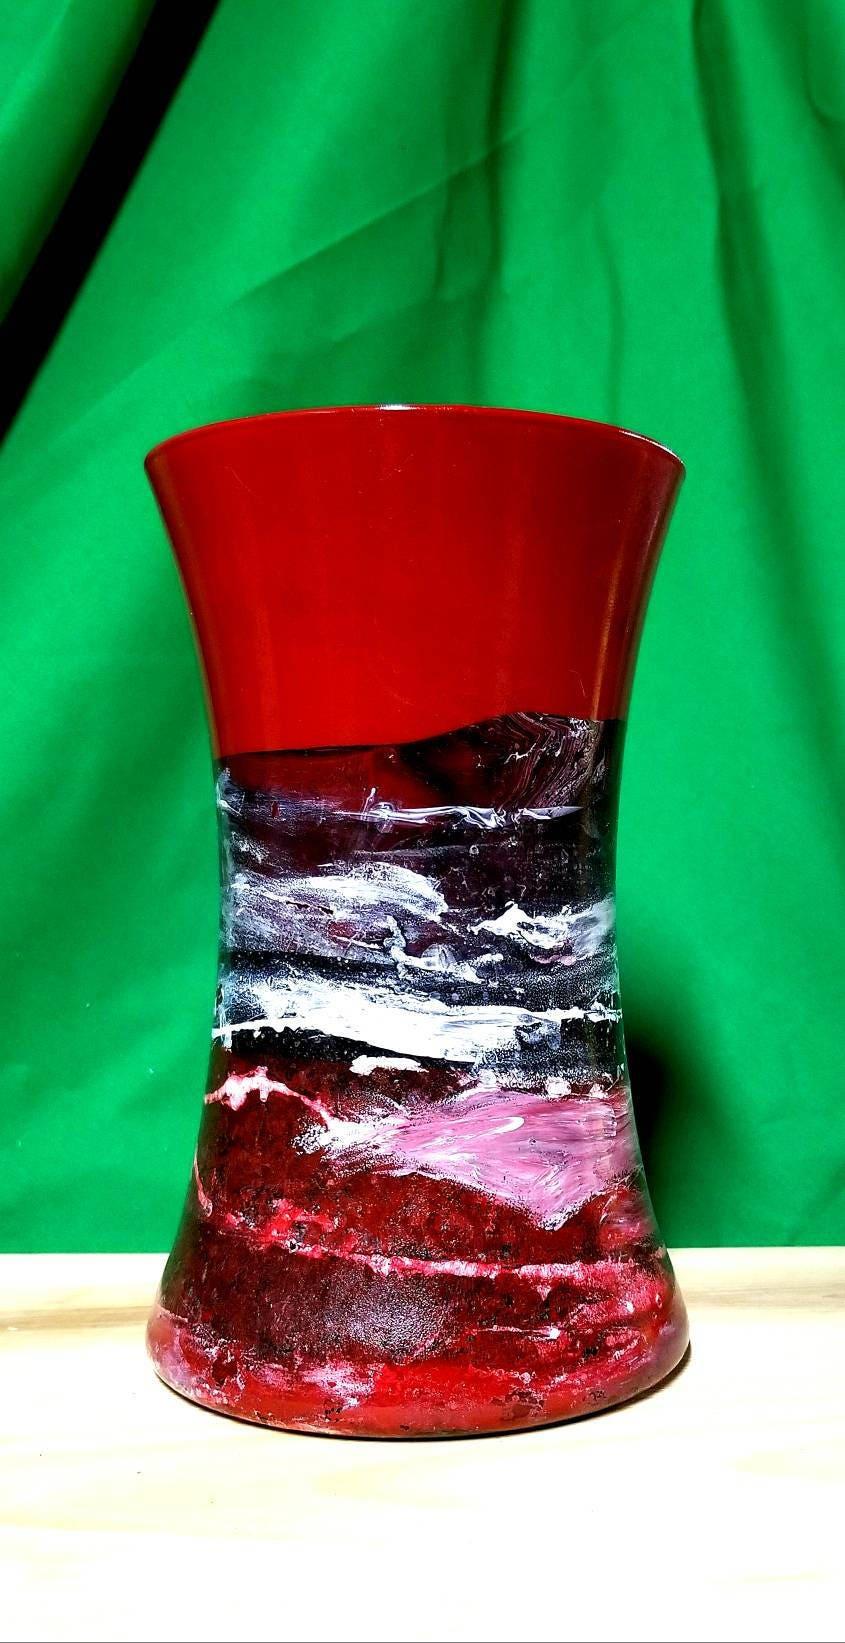 Black red glass vase moderntall red vasemodern red glass zoom reviewsmspy